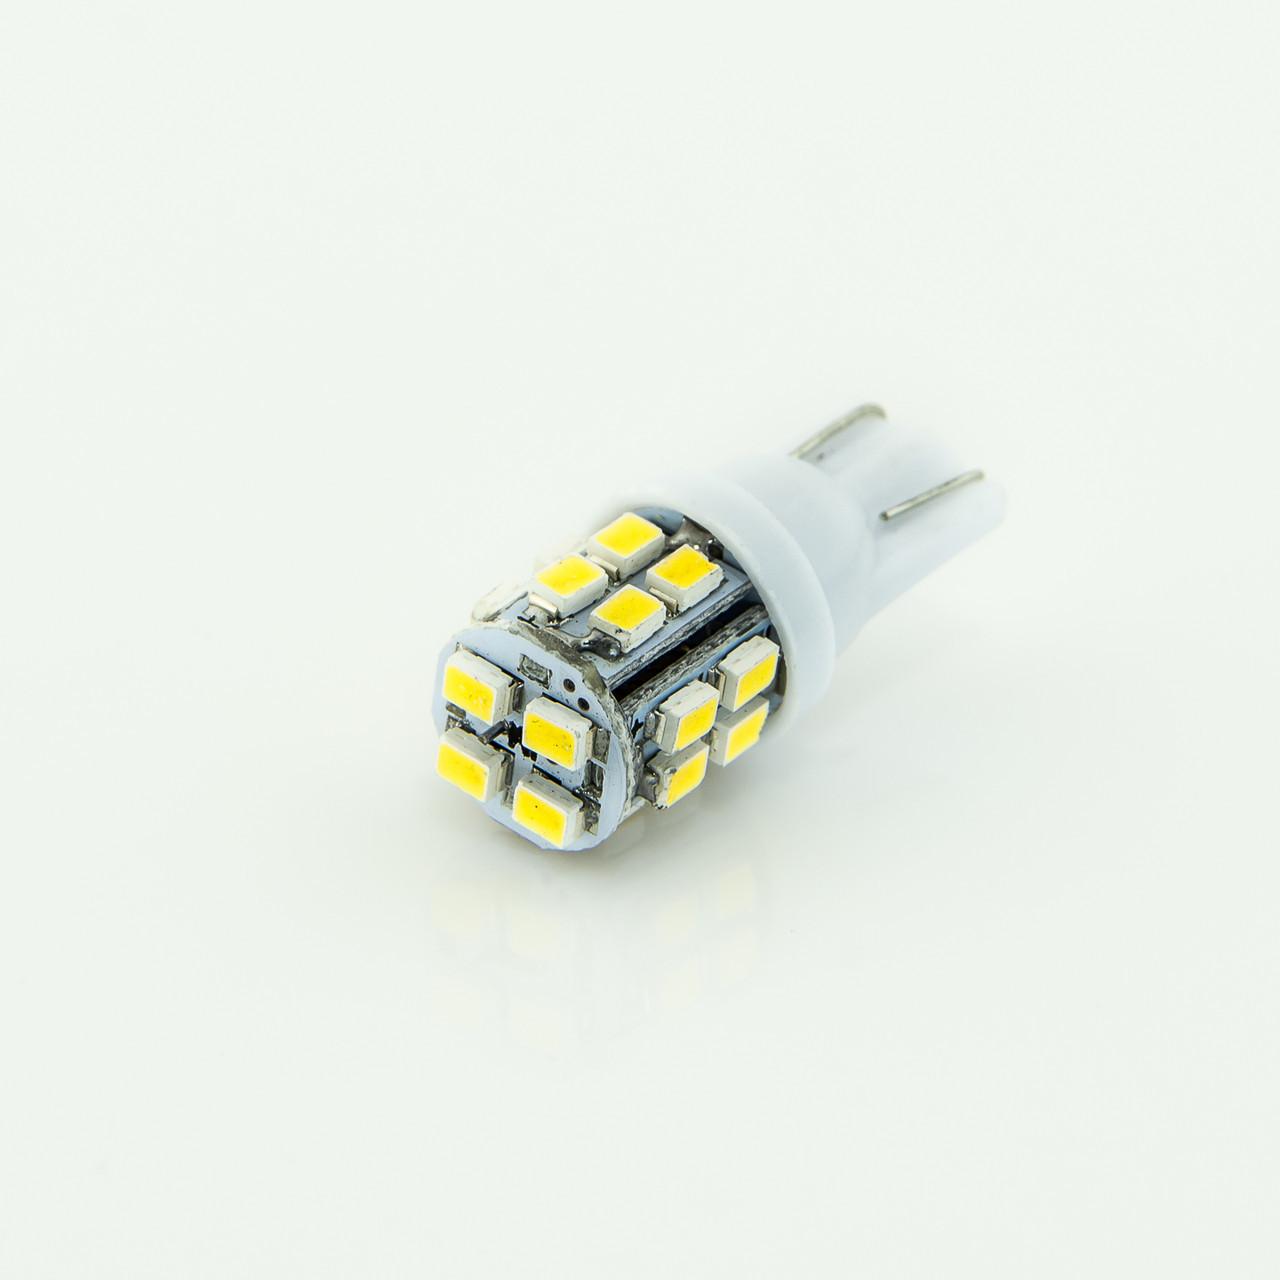 Лампа LED 12V T10 (W5W) 20SMD 3020 55Lm БЕЛЫЙ